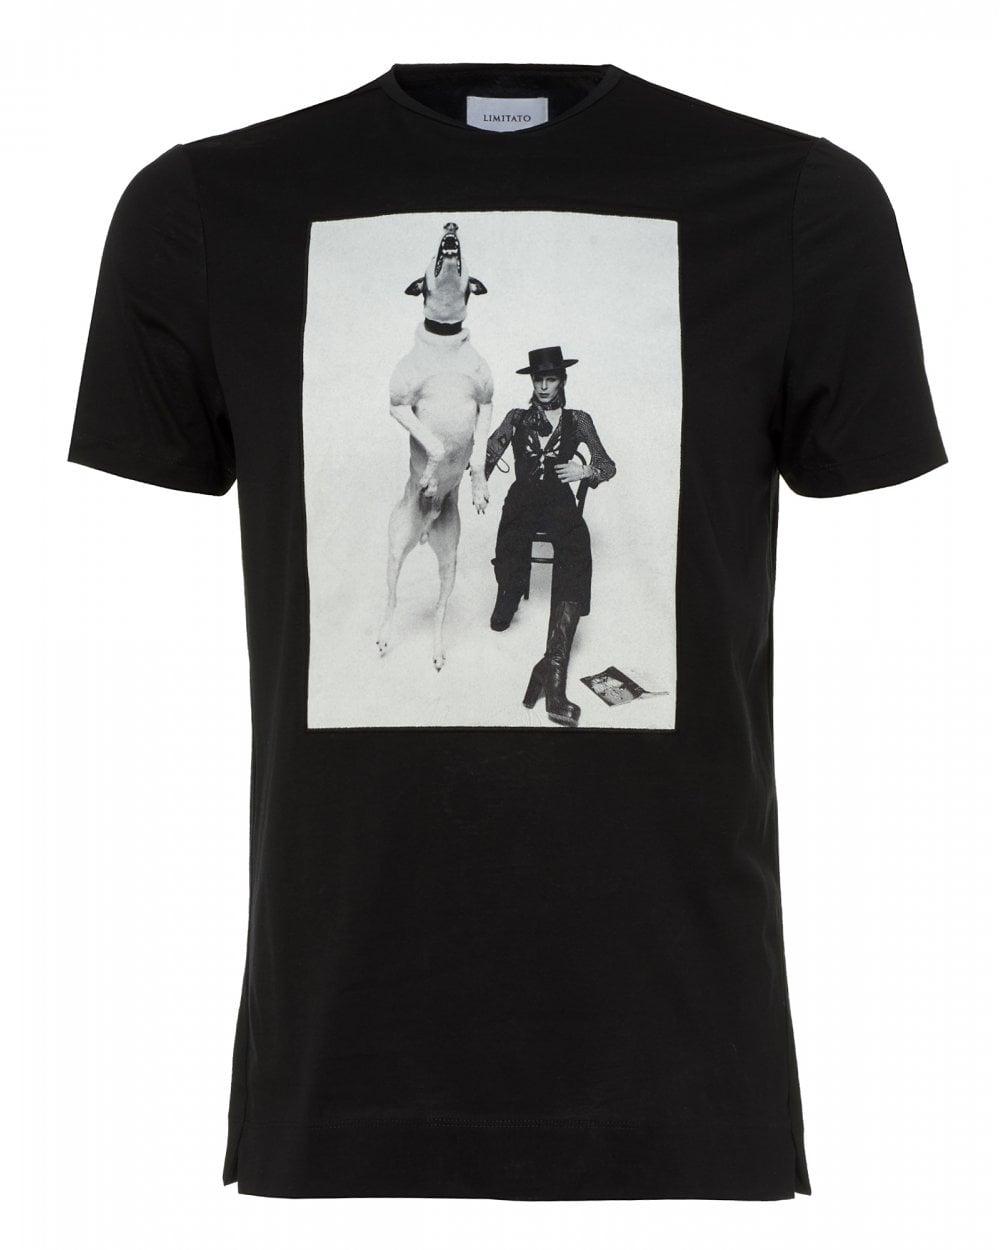 f55b75bf1 Limitato Mens Diamond Dogs T-Shirt, David Bowie Black Tee